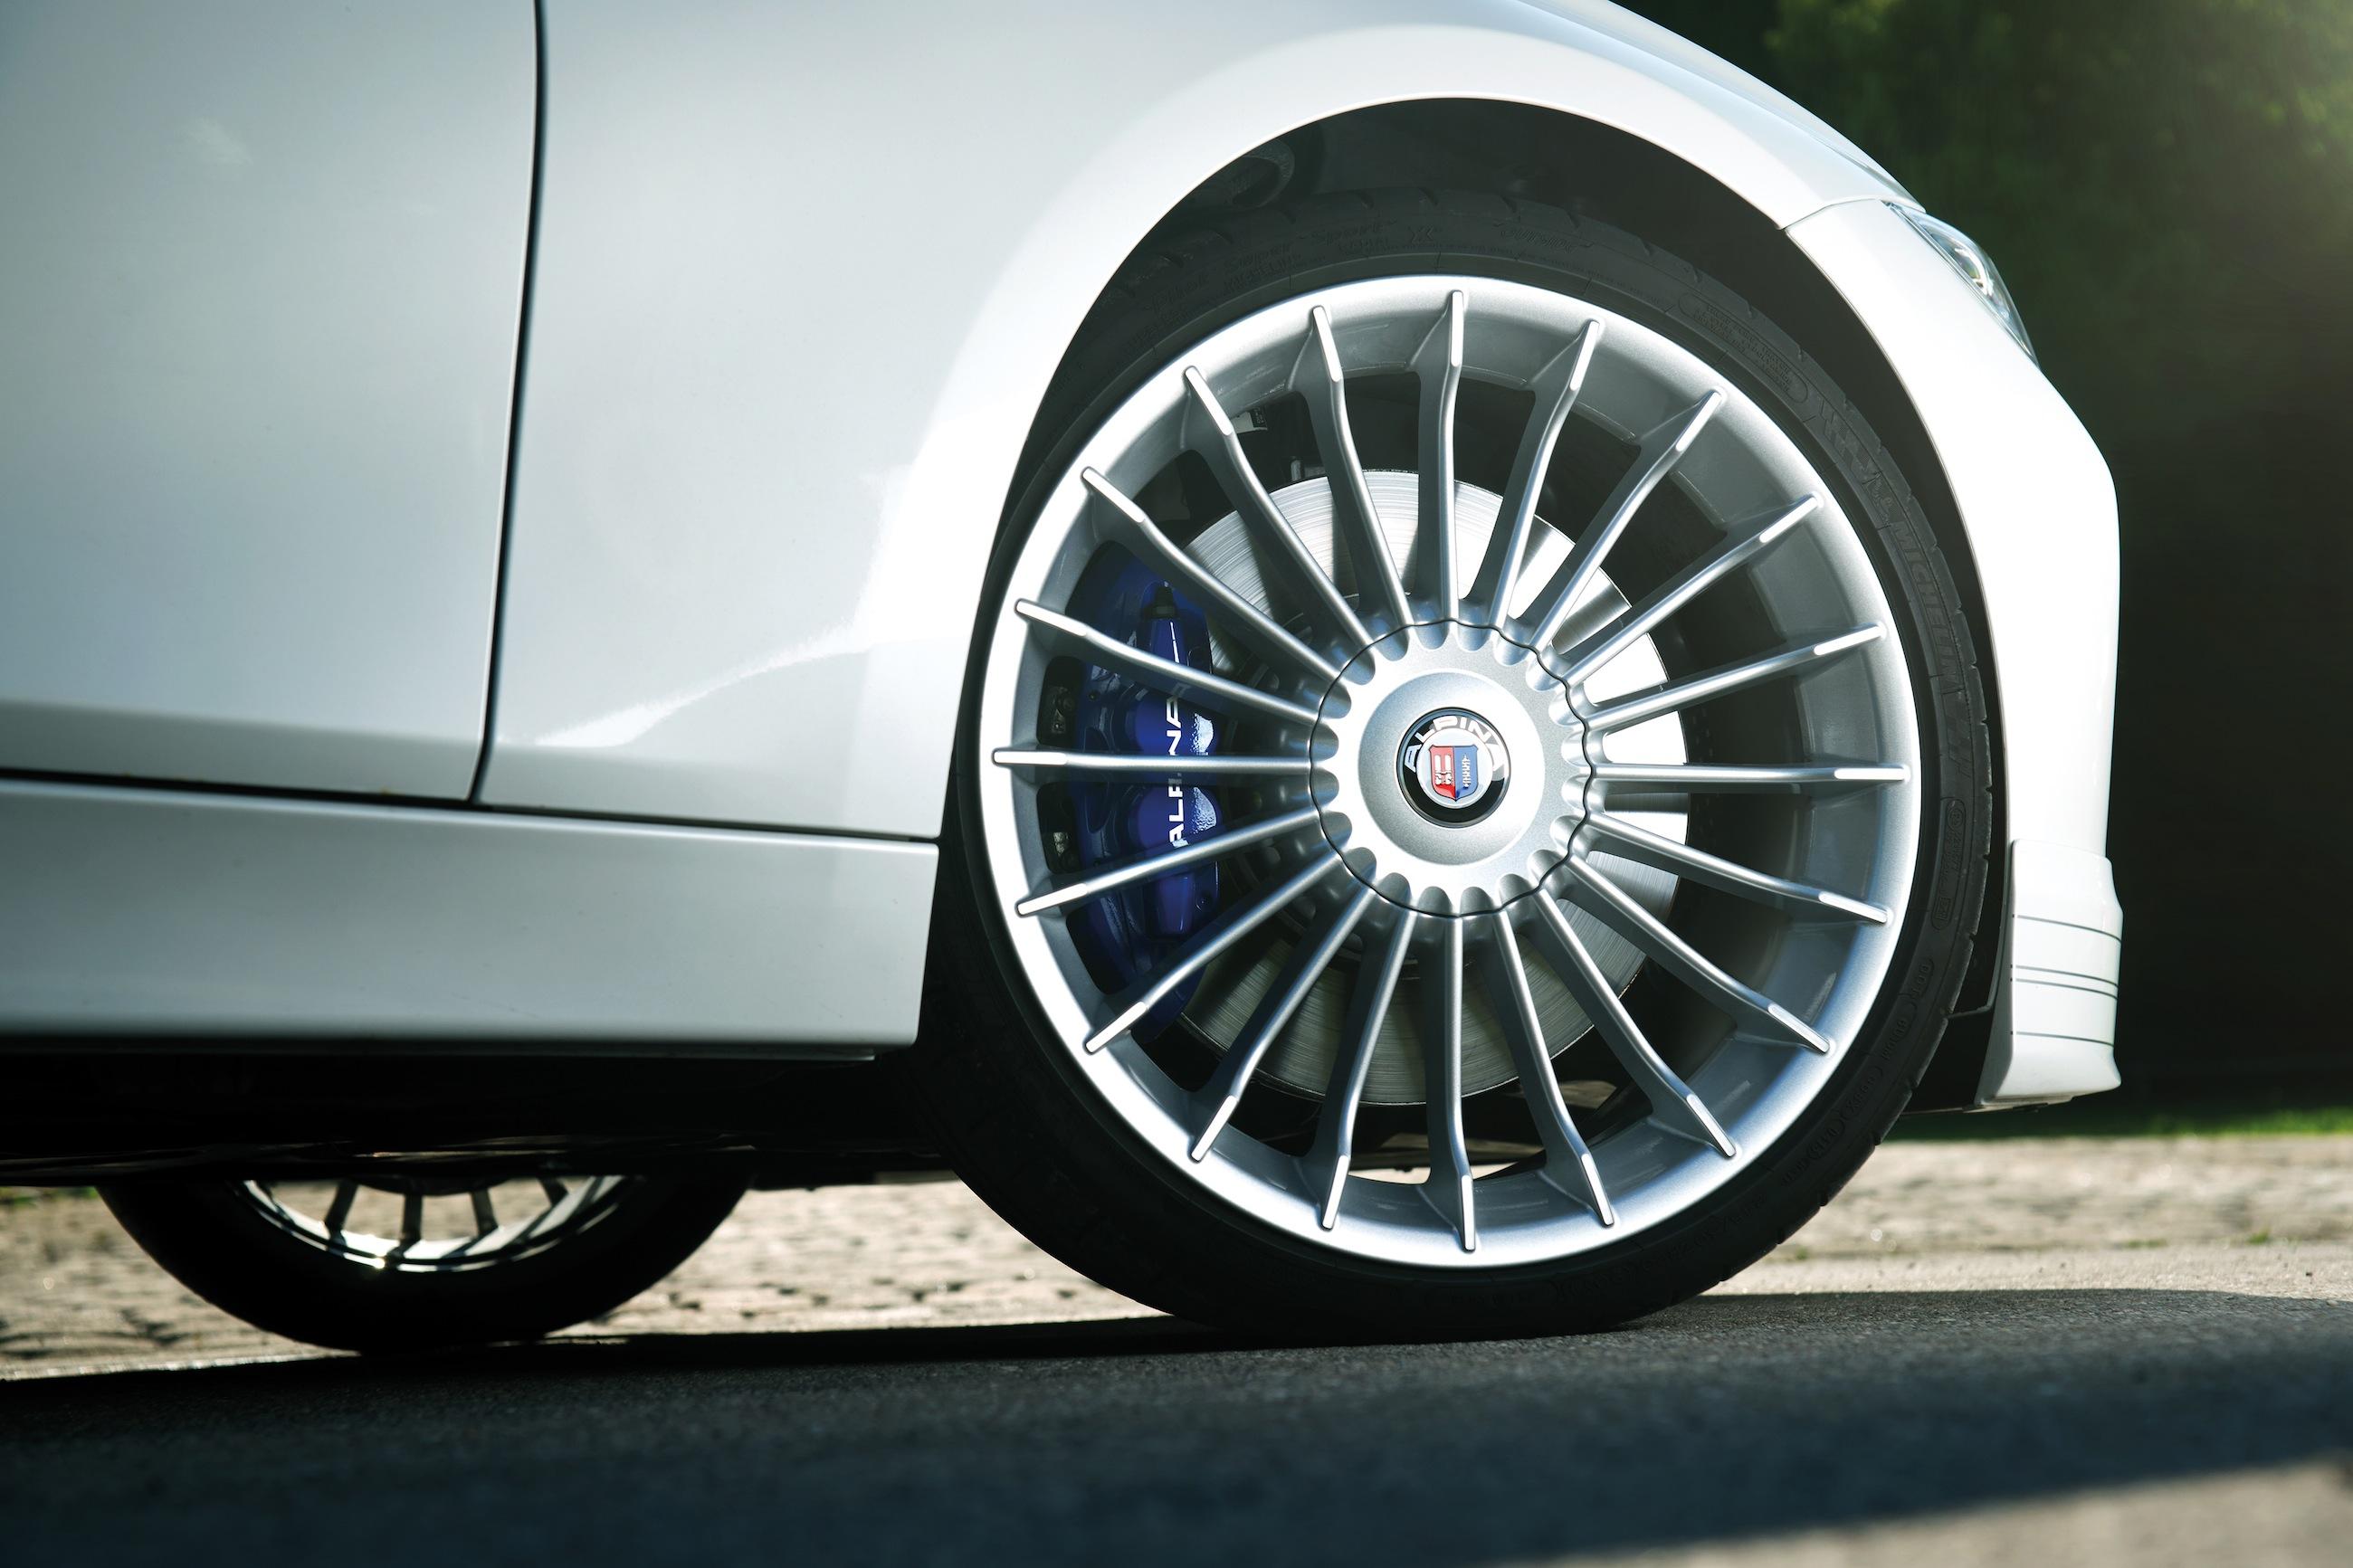 Bmw Alpina D3 Bi Turbo Full Reveal And Details